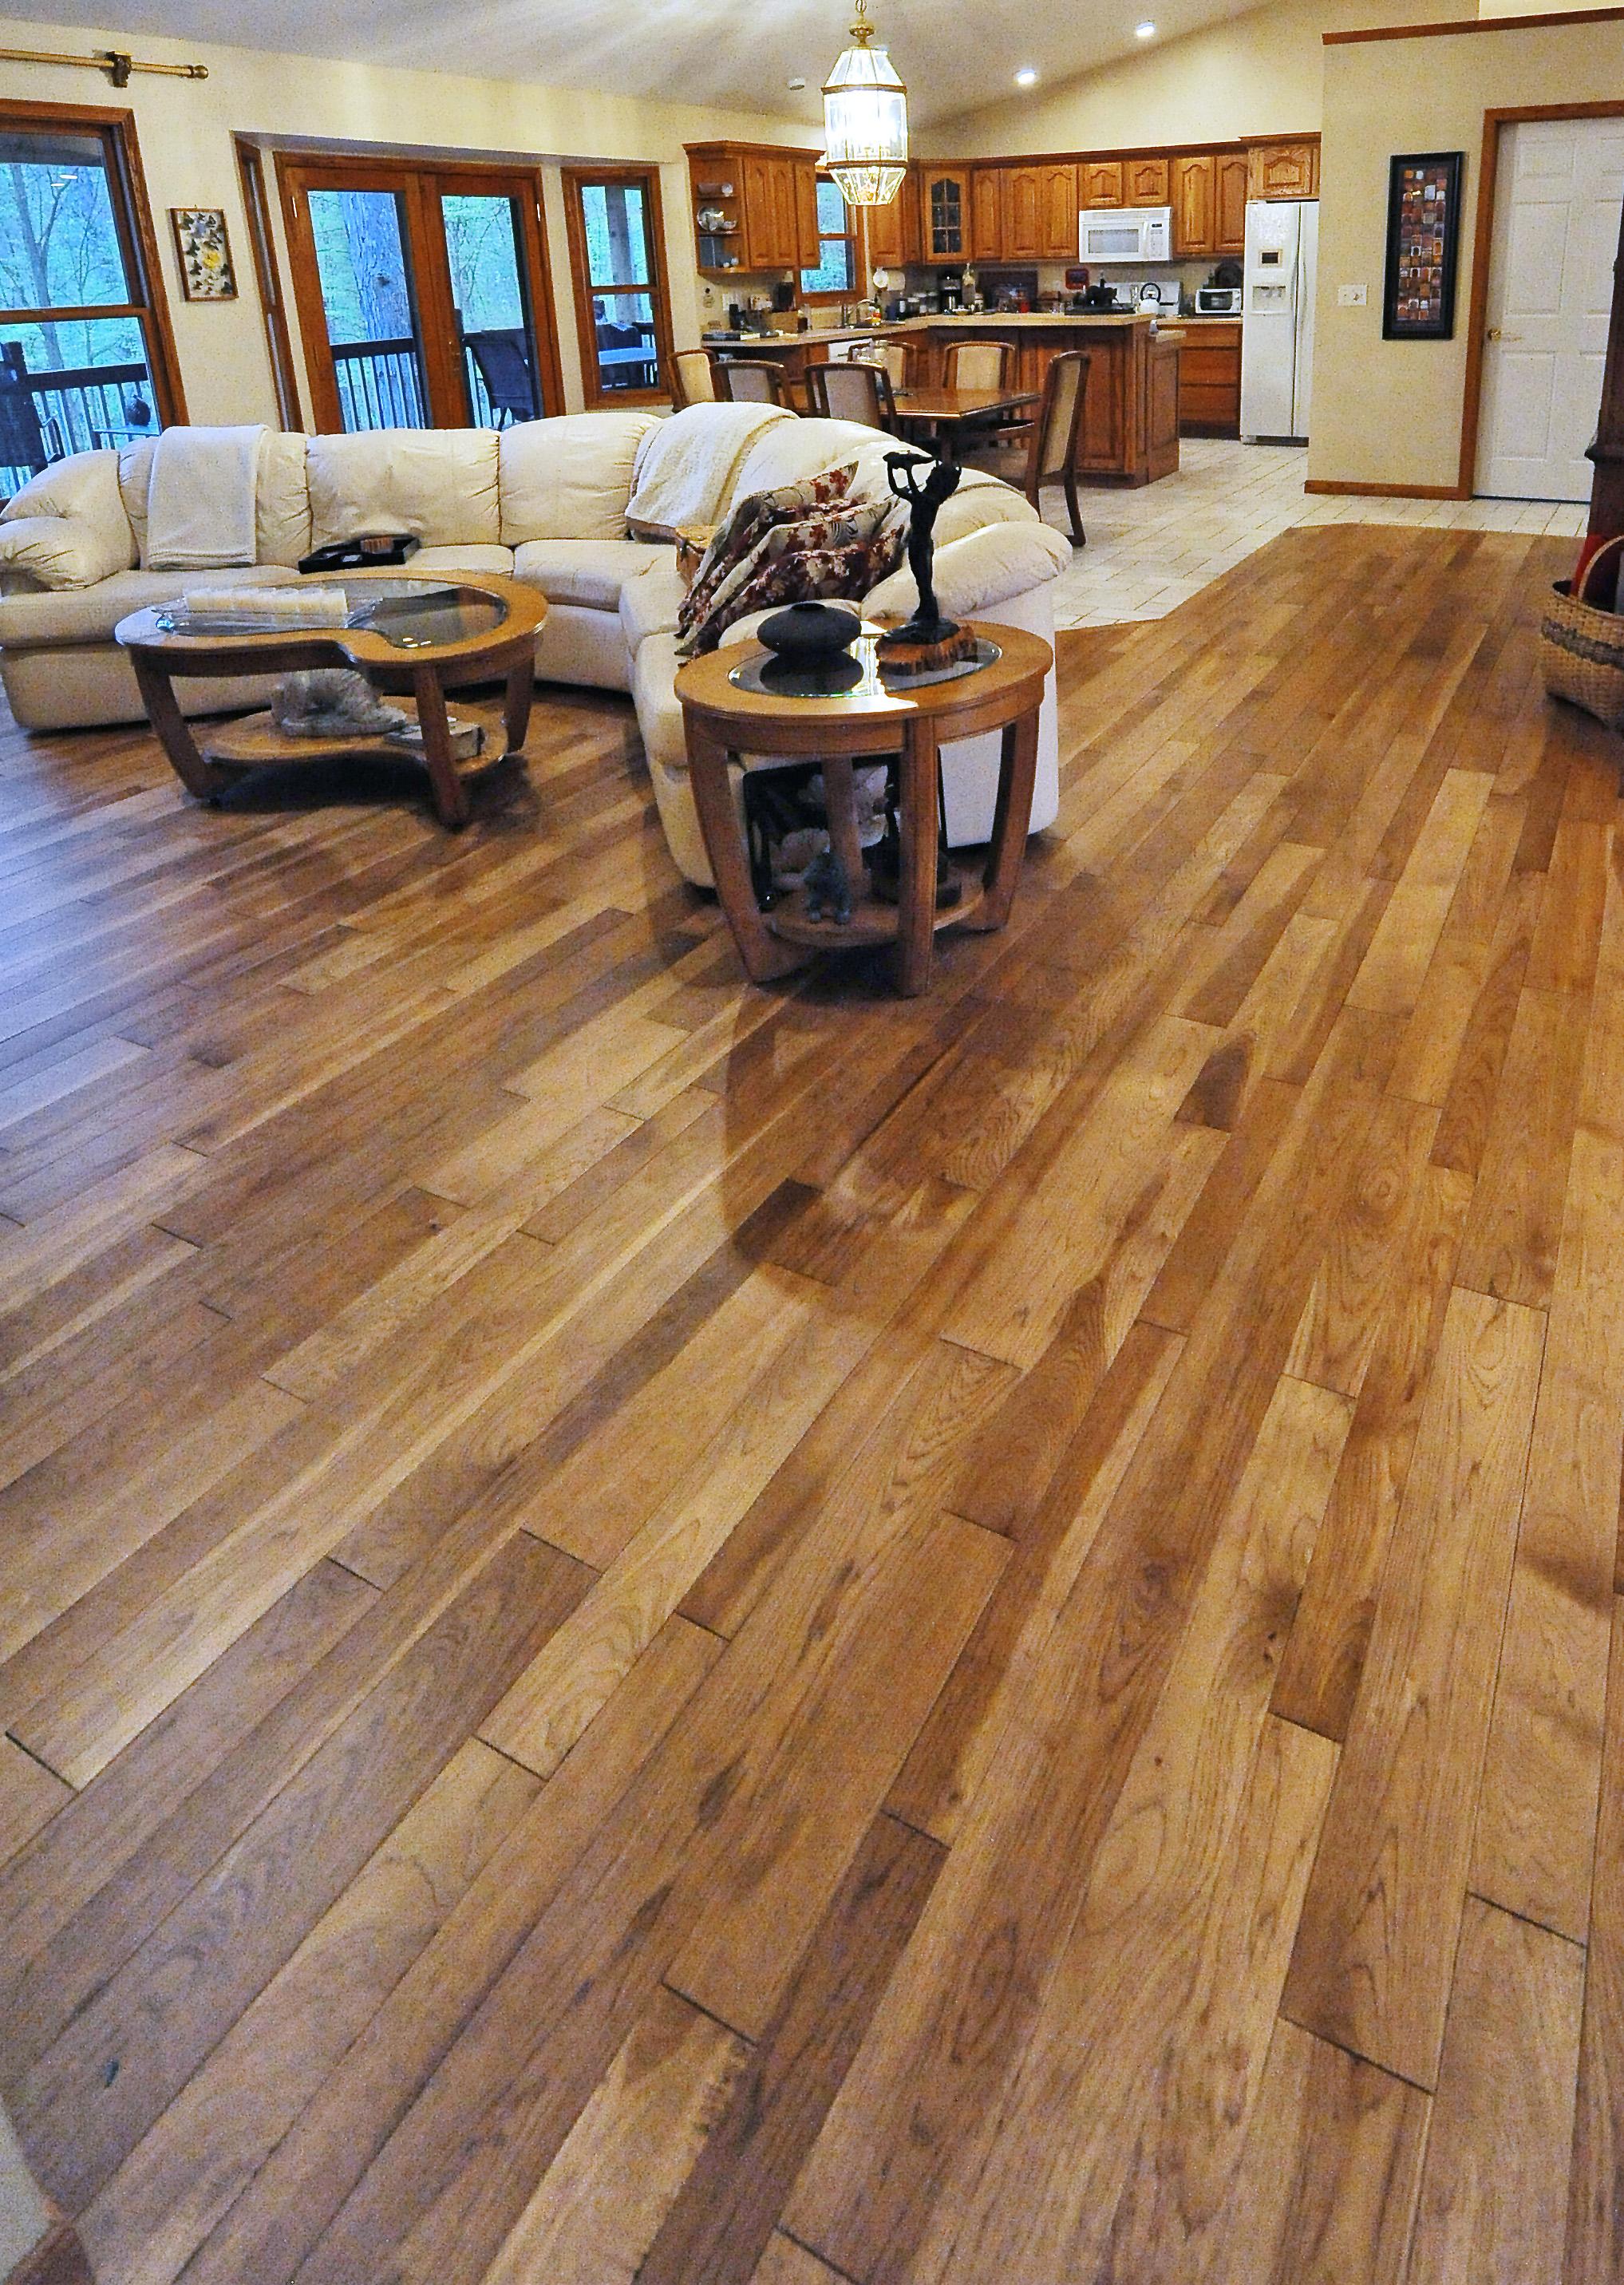 durable hardwood flooring wood floor sofa table lamps kitchen set PCAMVZD